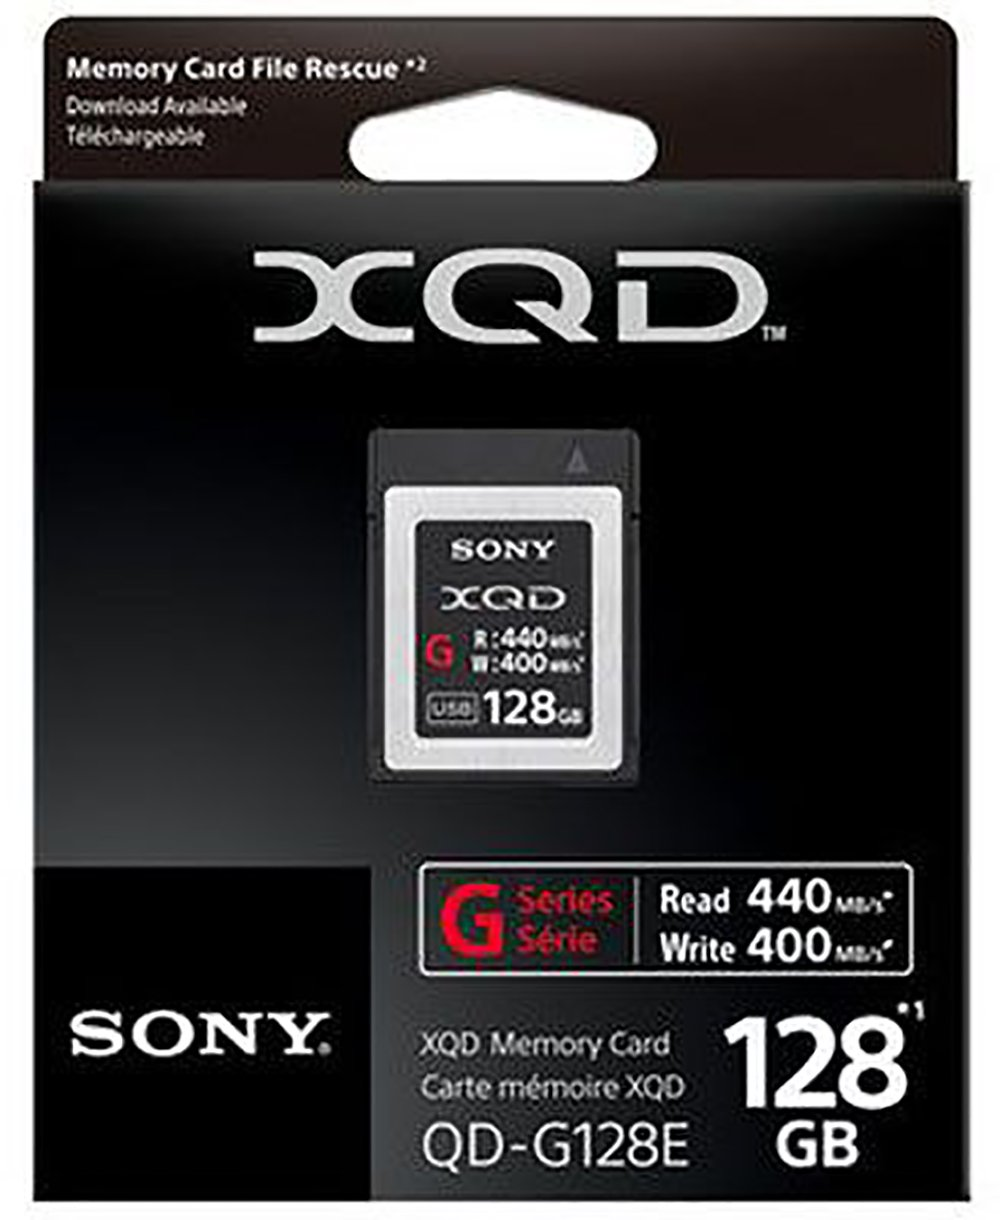 Carte Xqd 128 Go.Sony 128gb Xqd Flash Memory Card G Series Read 440mb S And Write